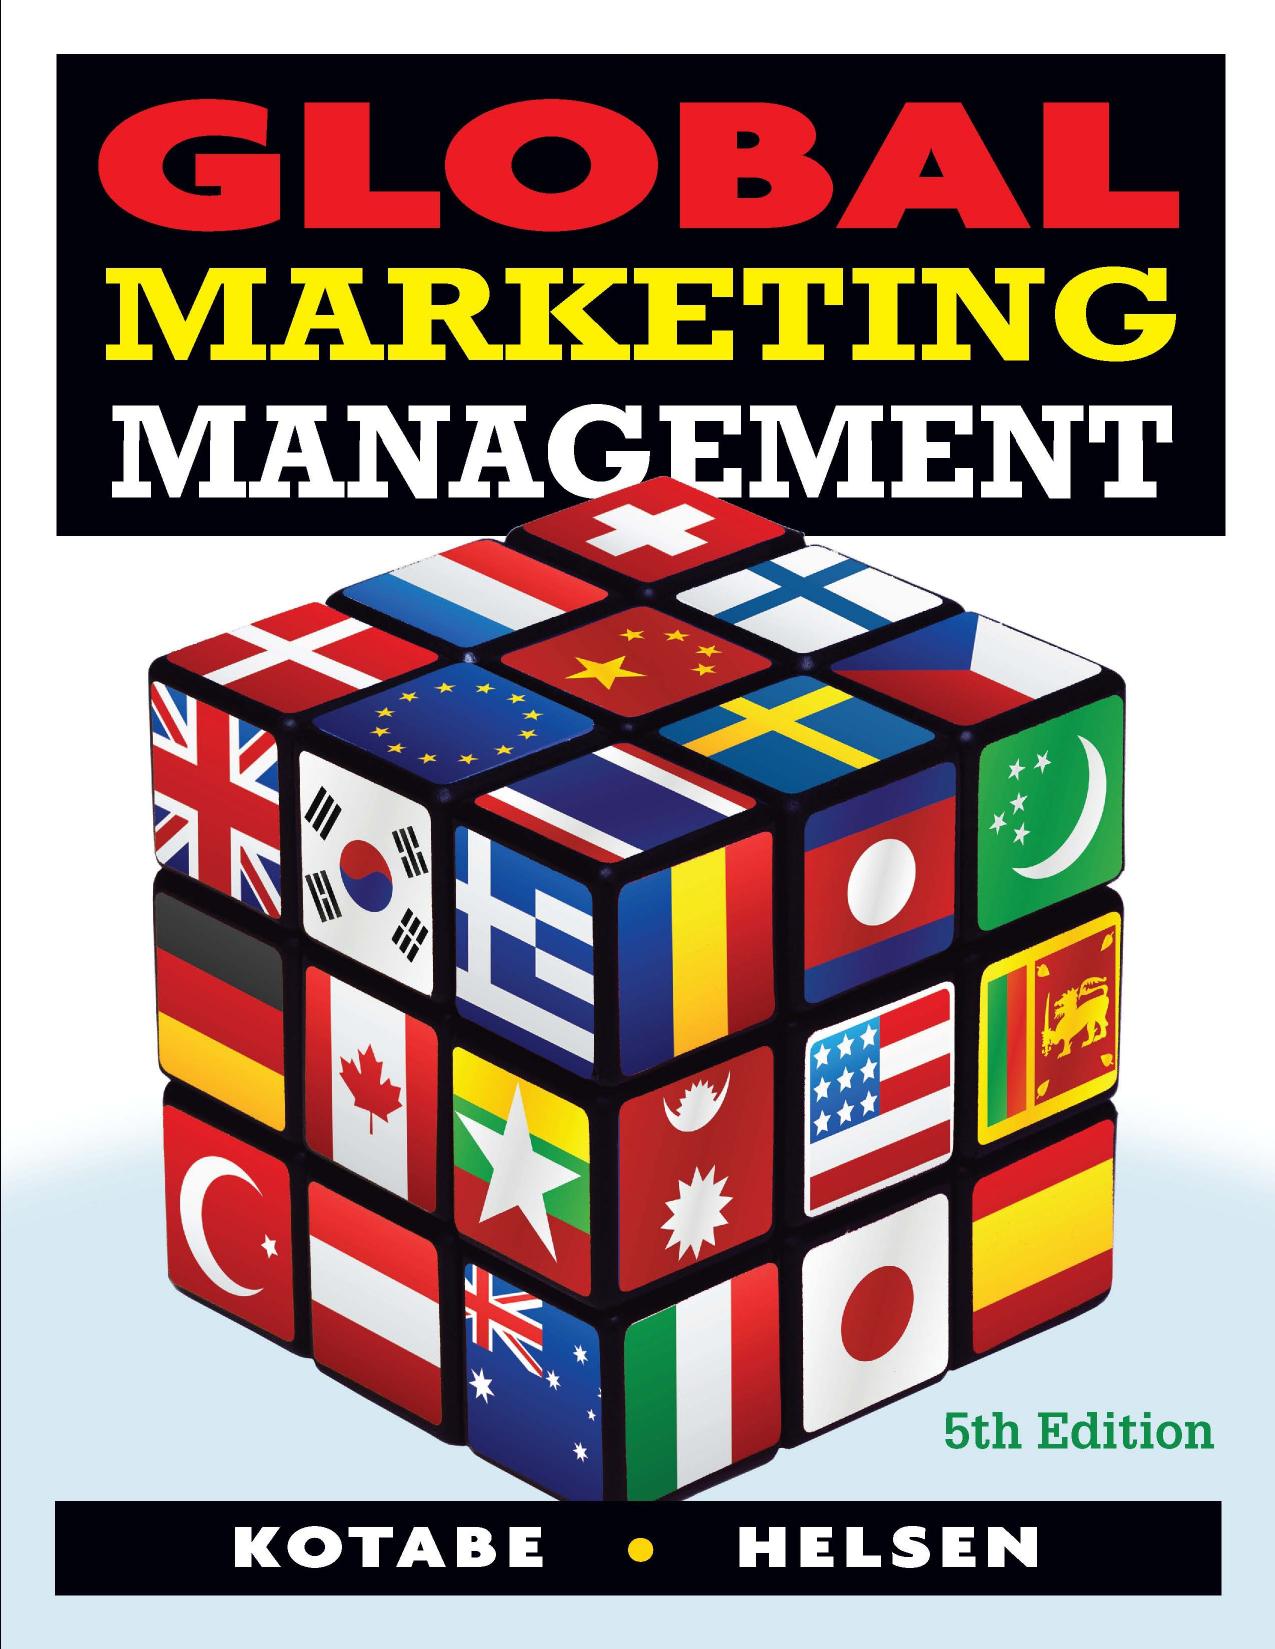 GlobalMarketing Management English 5th.pdf